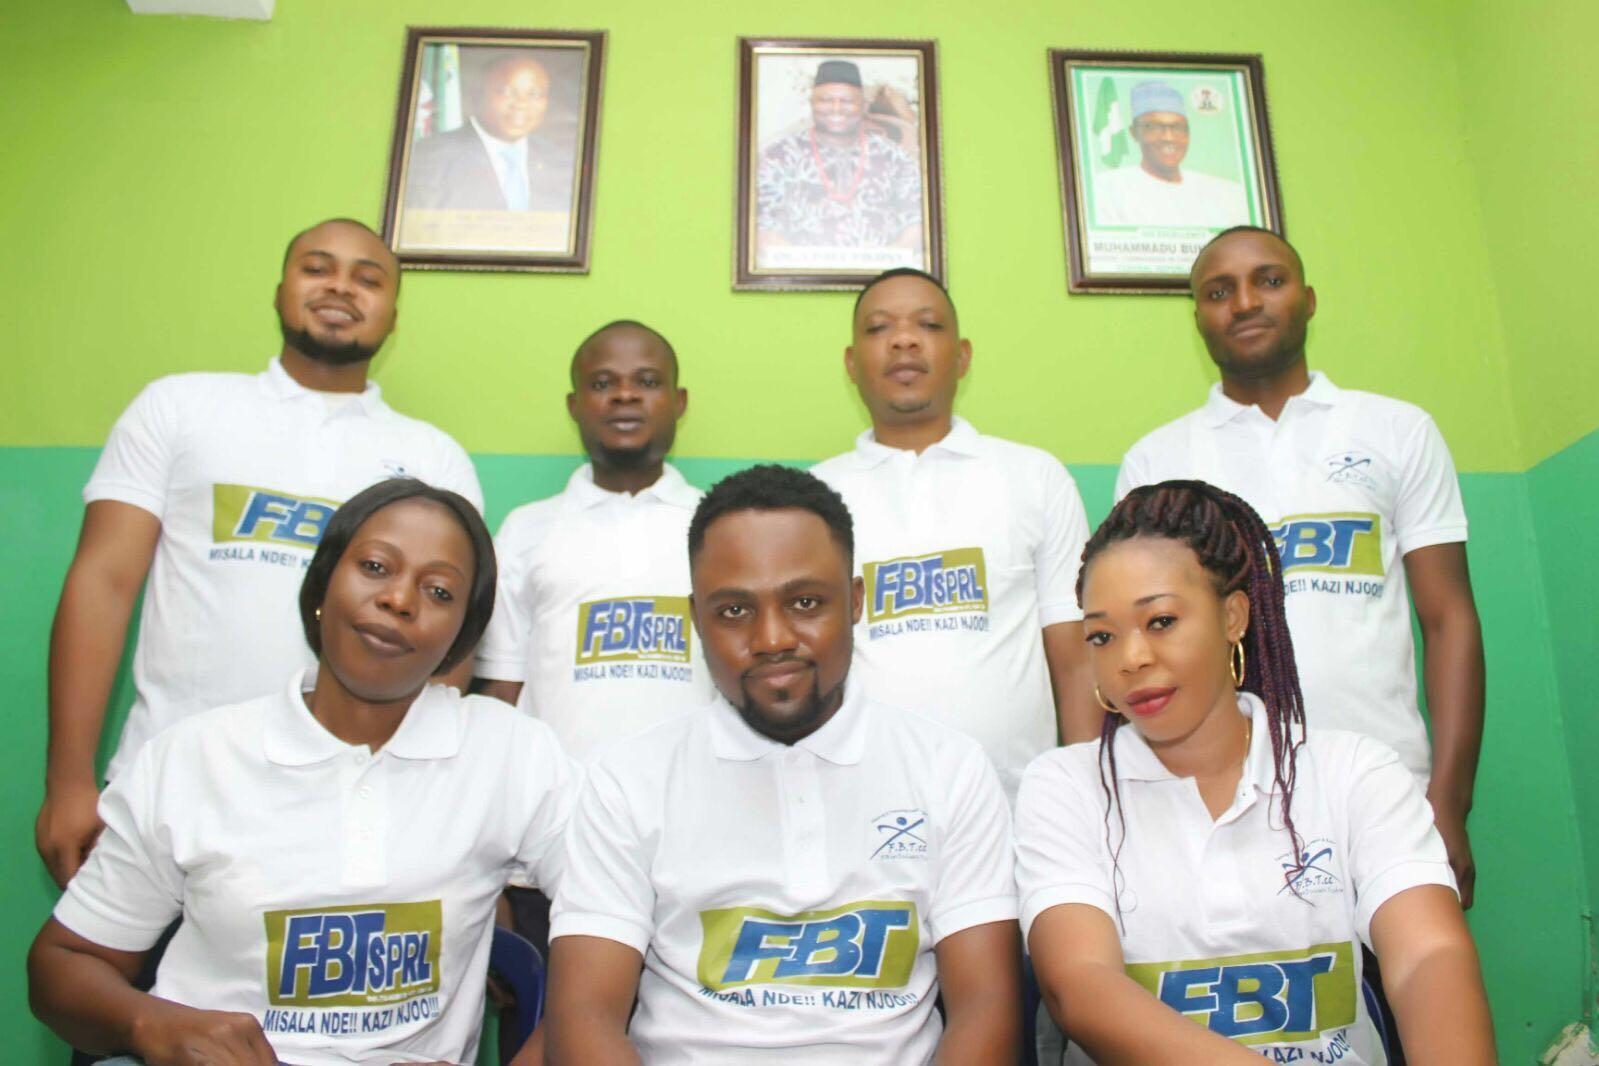 FBT Nigeria 6